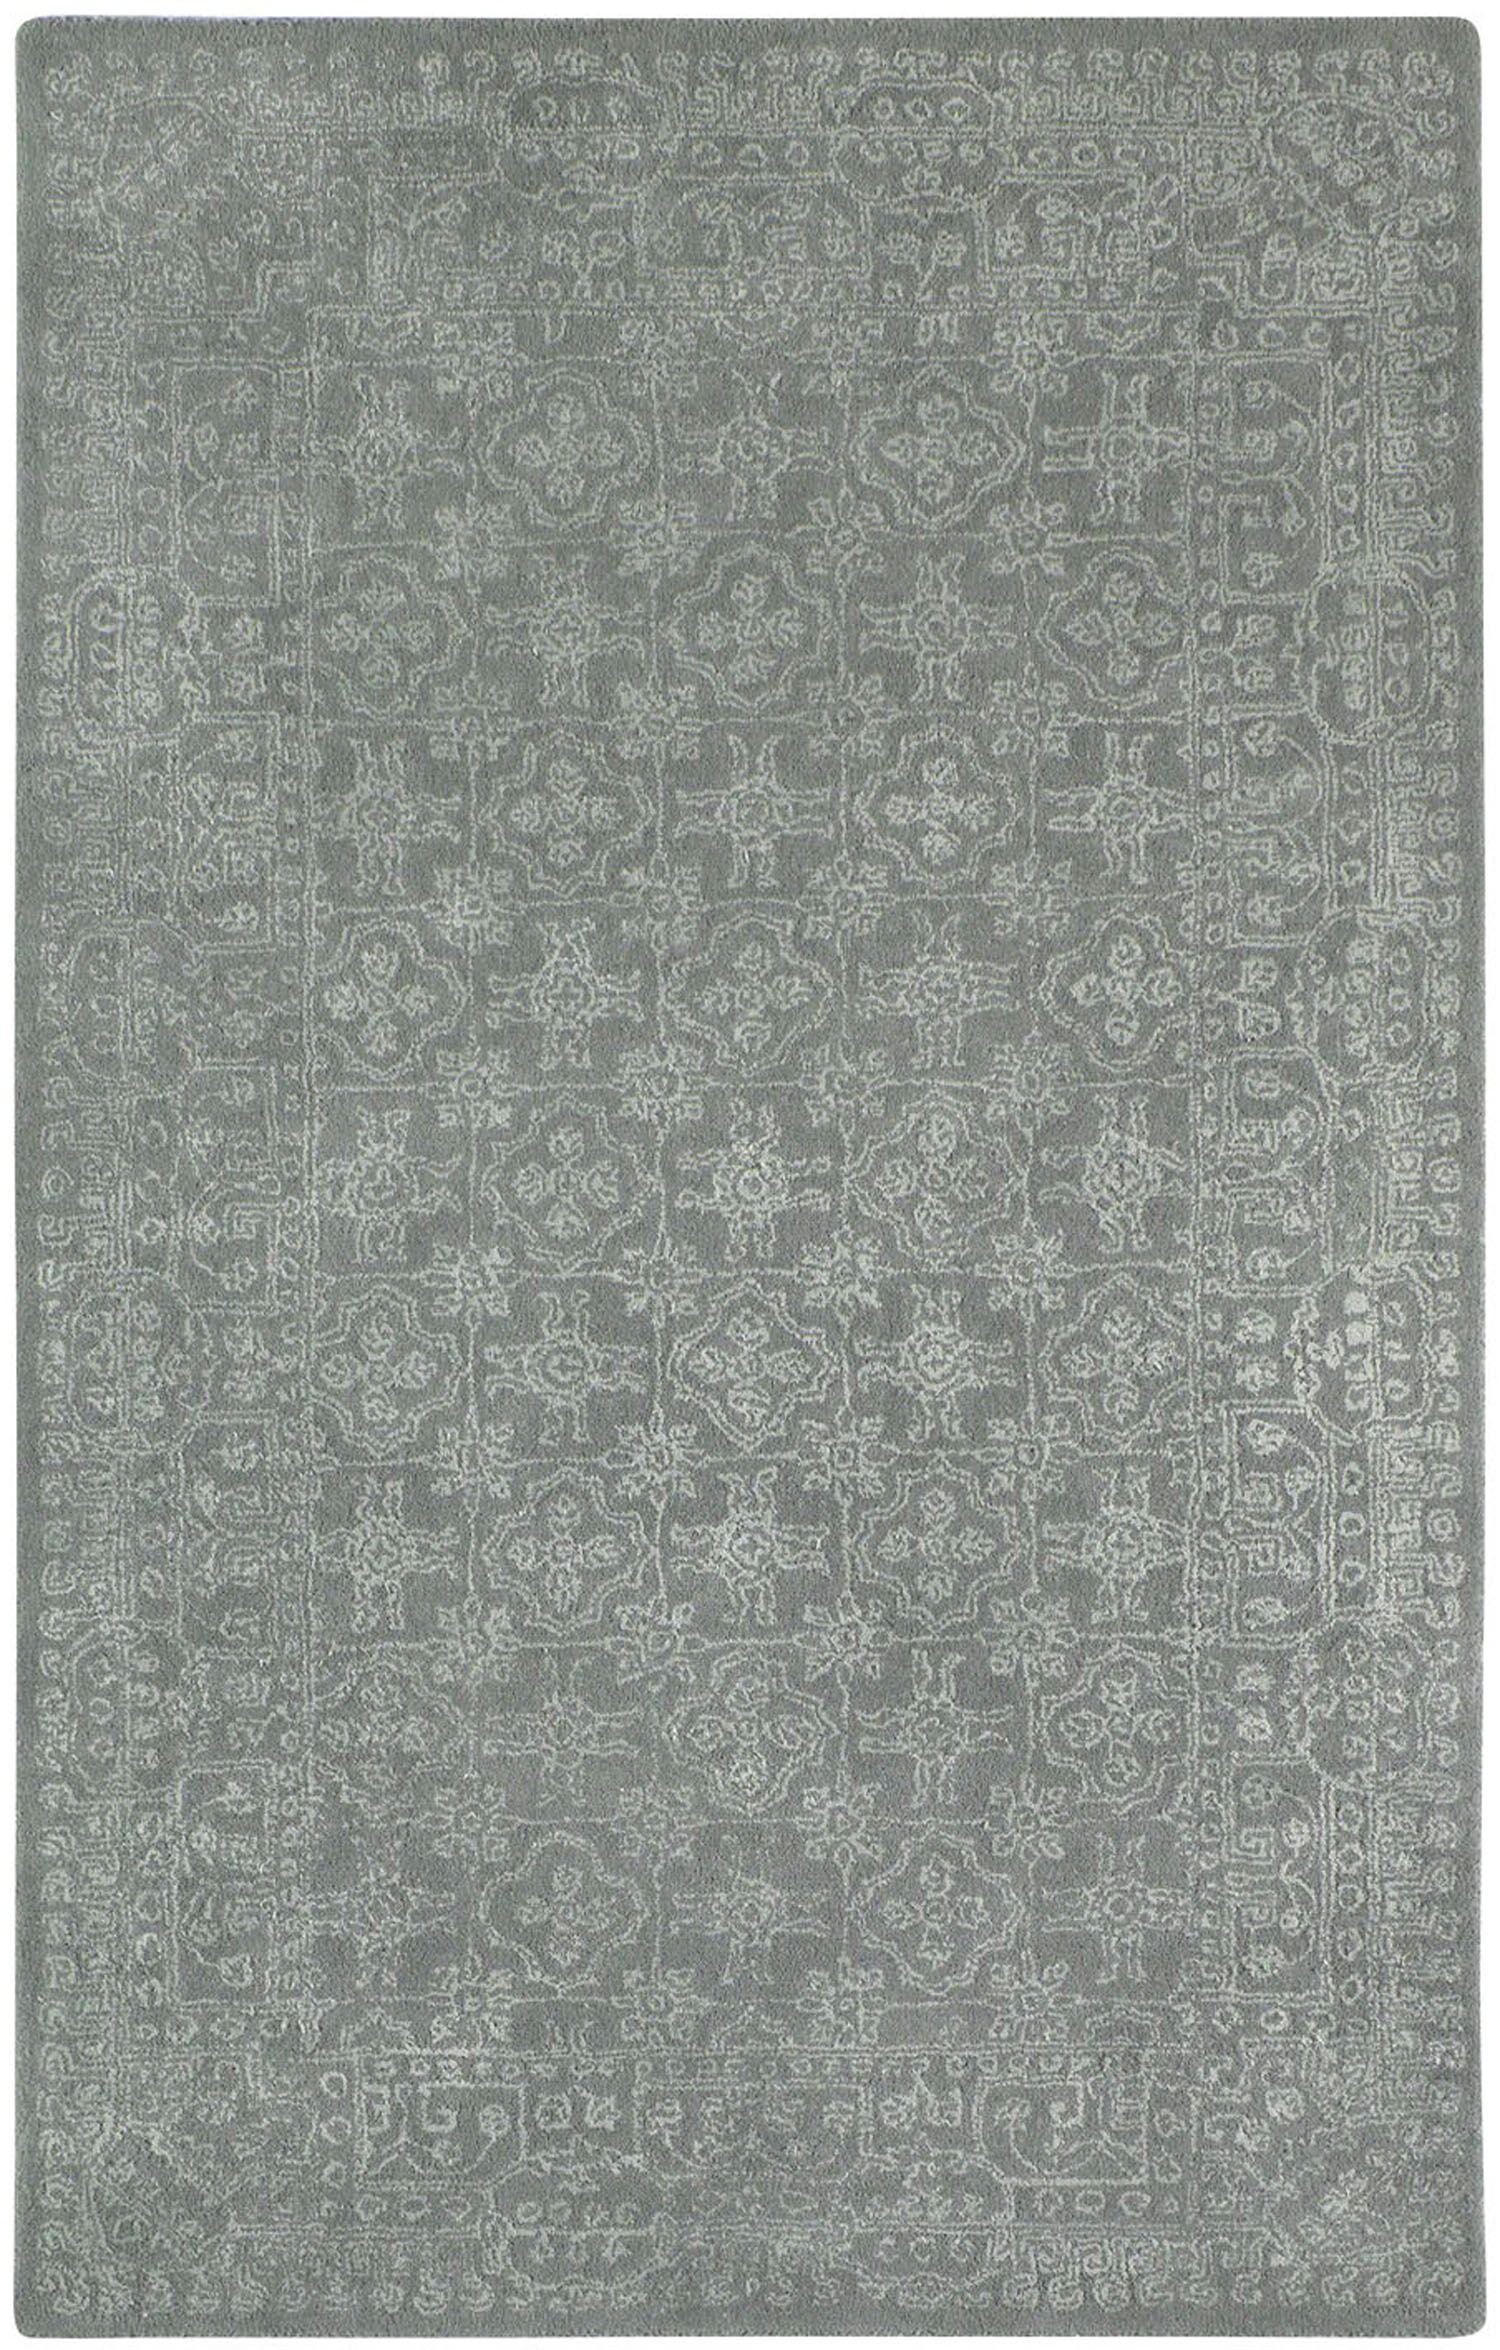 Interlace Smoky Area Rug Rug Size: Rectangle 7' x 9'